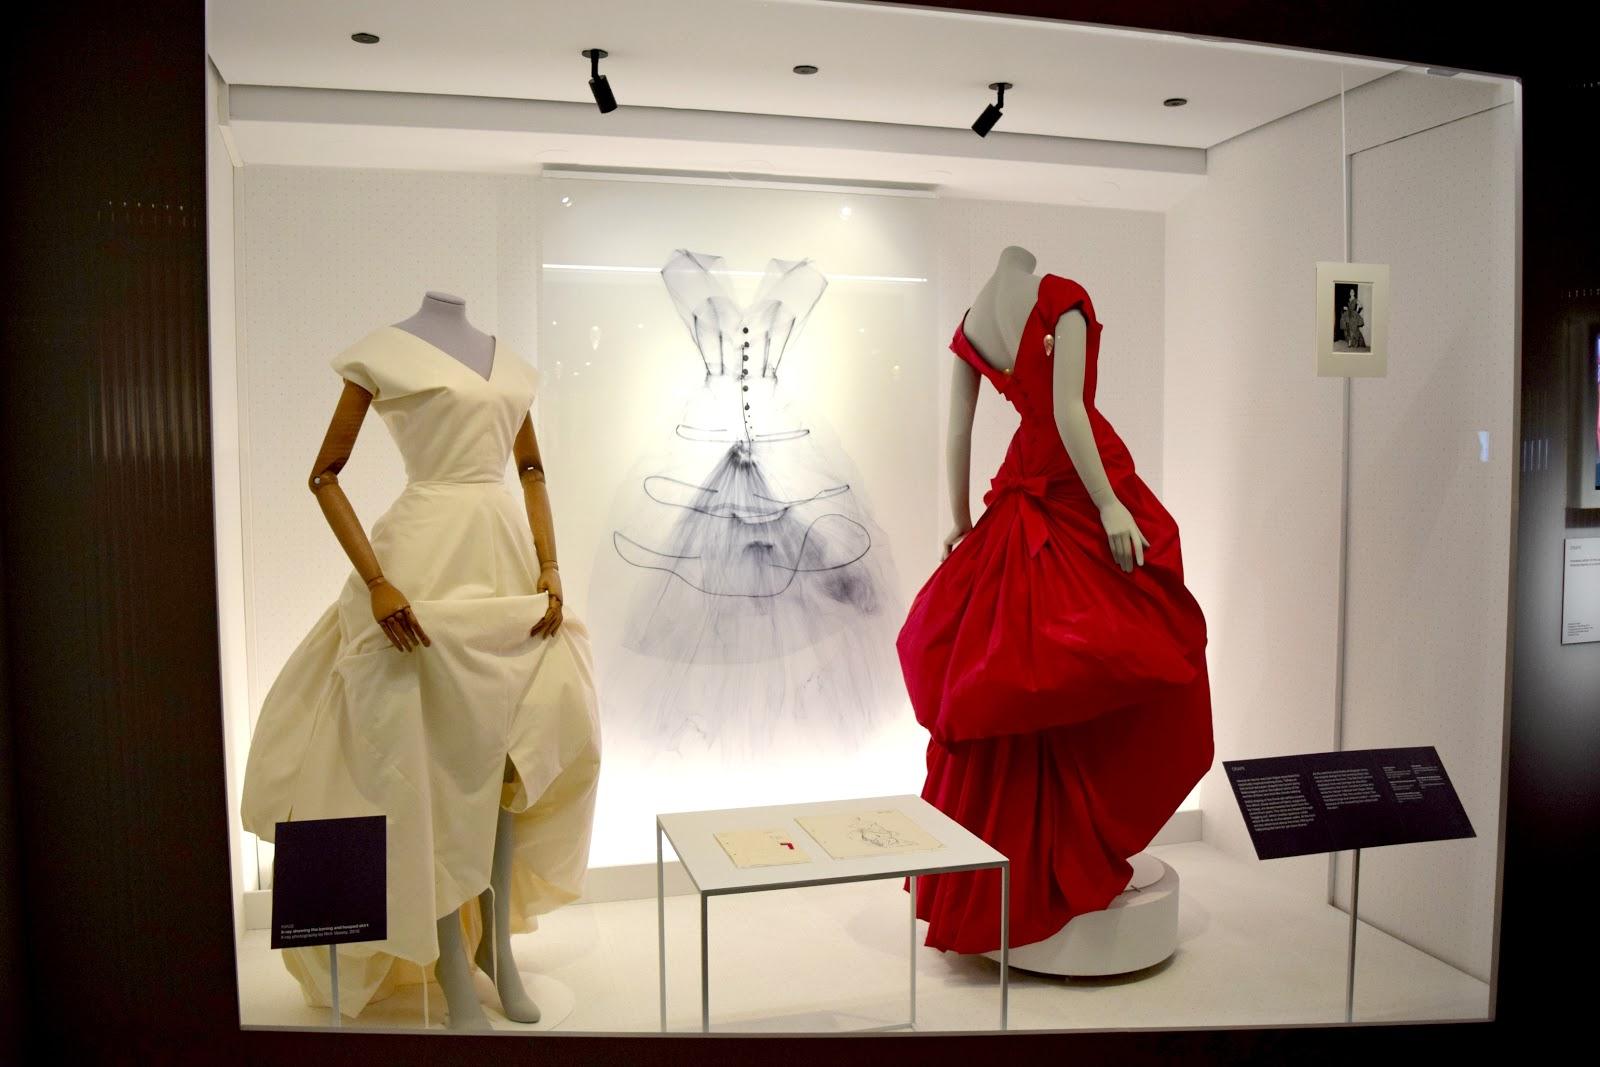 x-ray technology in fashion balenciaga exhibition london